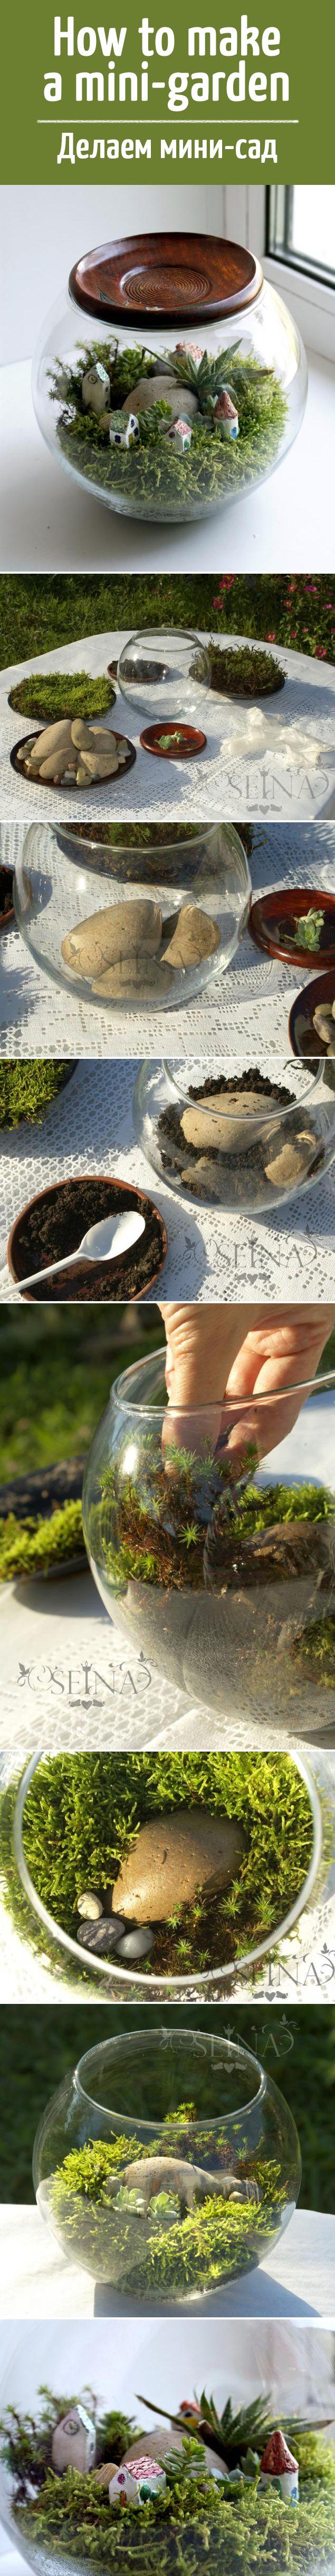 Haw to make a mini-garden / Как сделать мини-сад #мастеркласс #ручнаяработа…